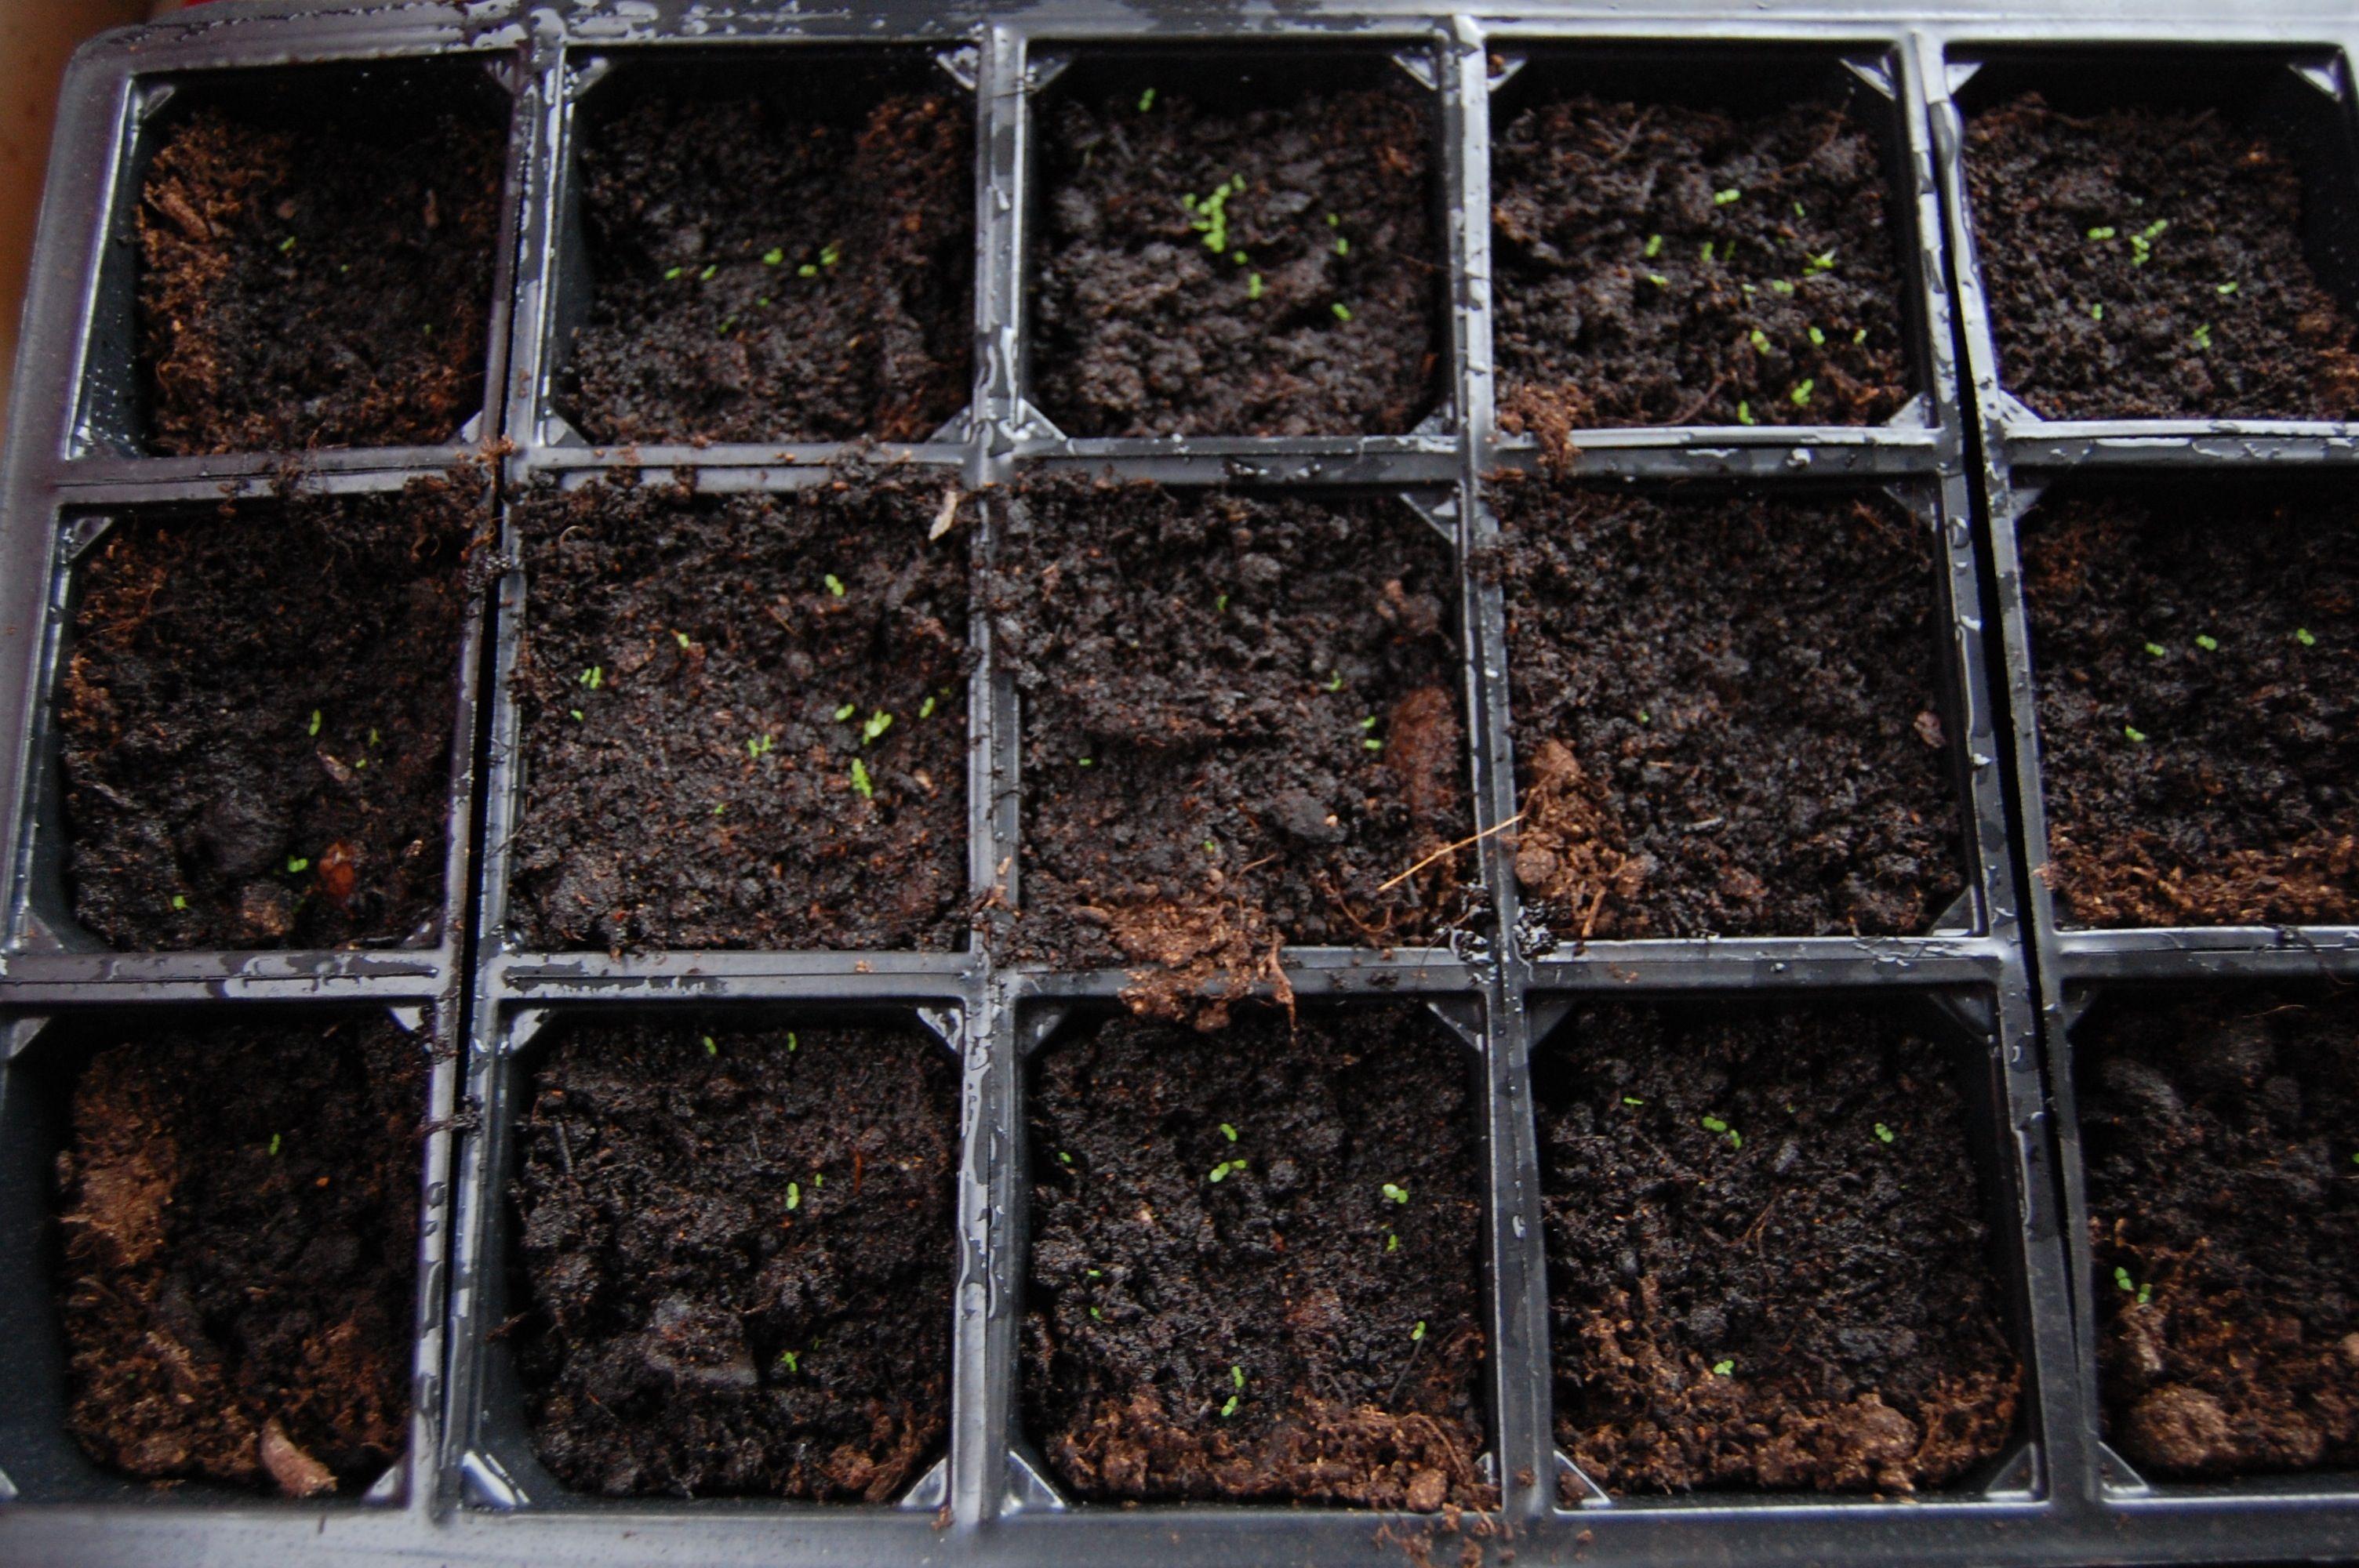 How To Germinate Nicotiana Seeds.